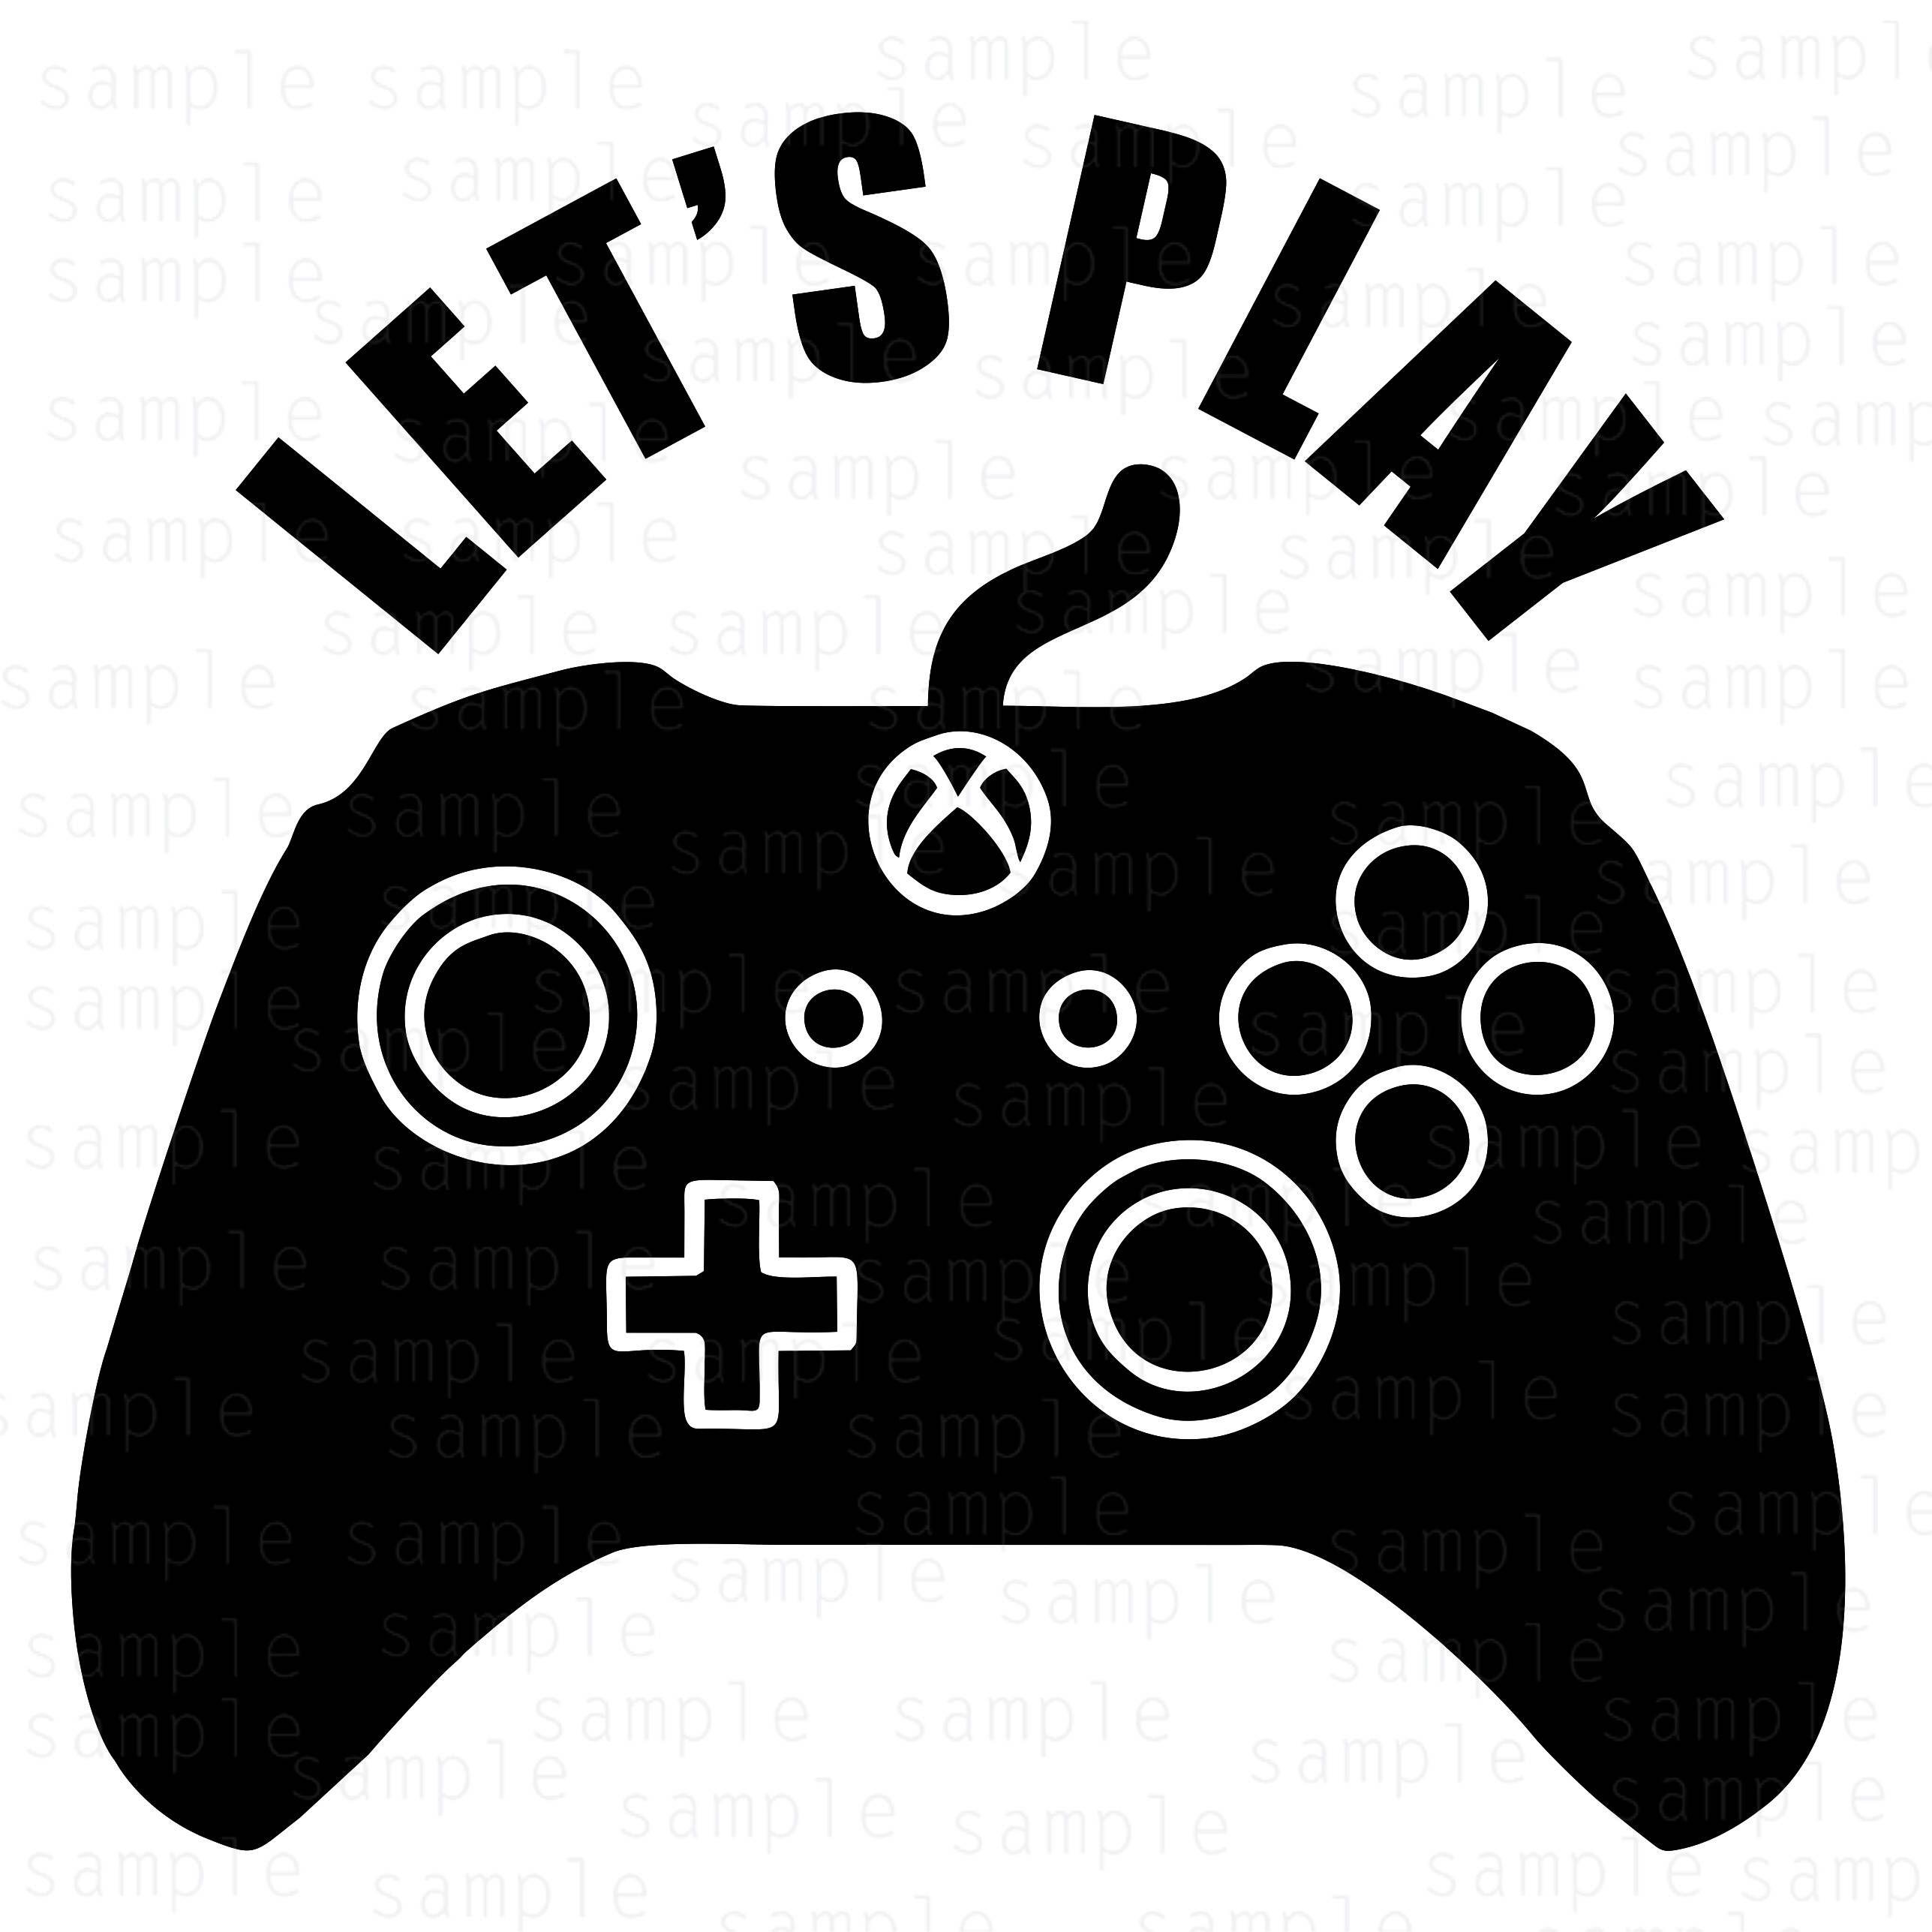 Pin By La Toya Smith On Jeremiah S Bedroom Xbox Party Xbox